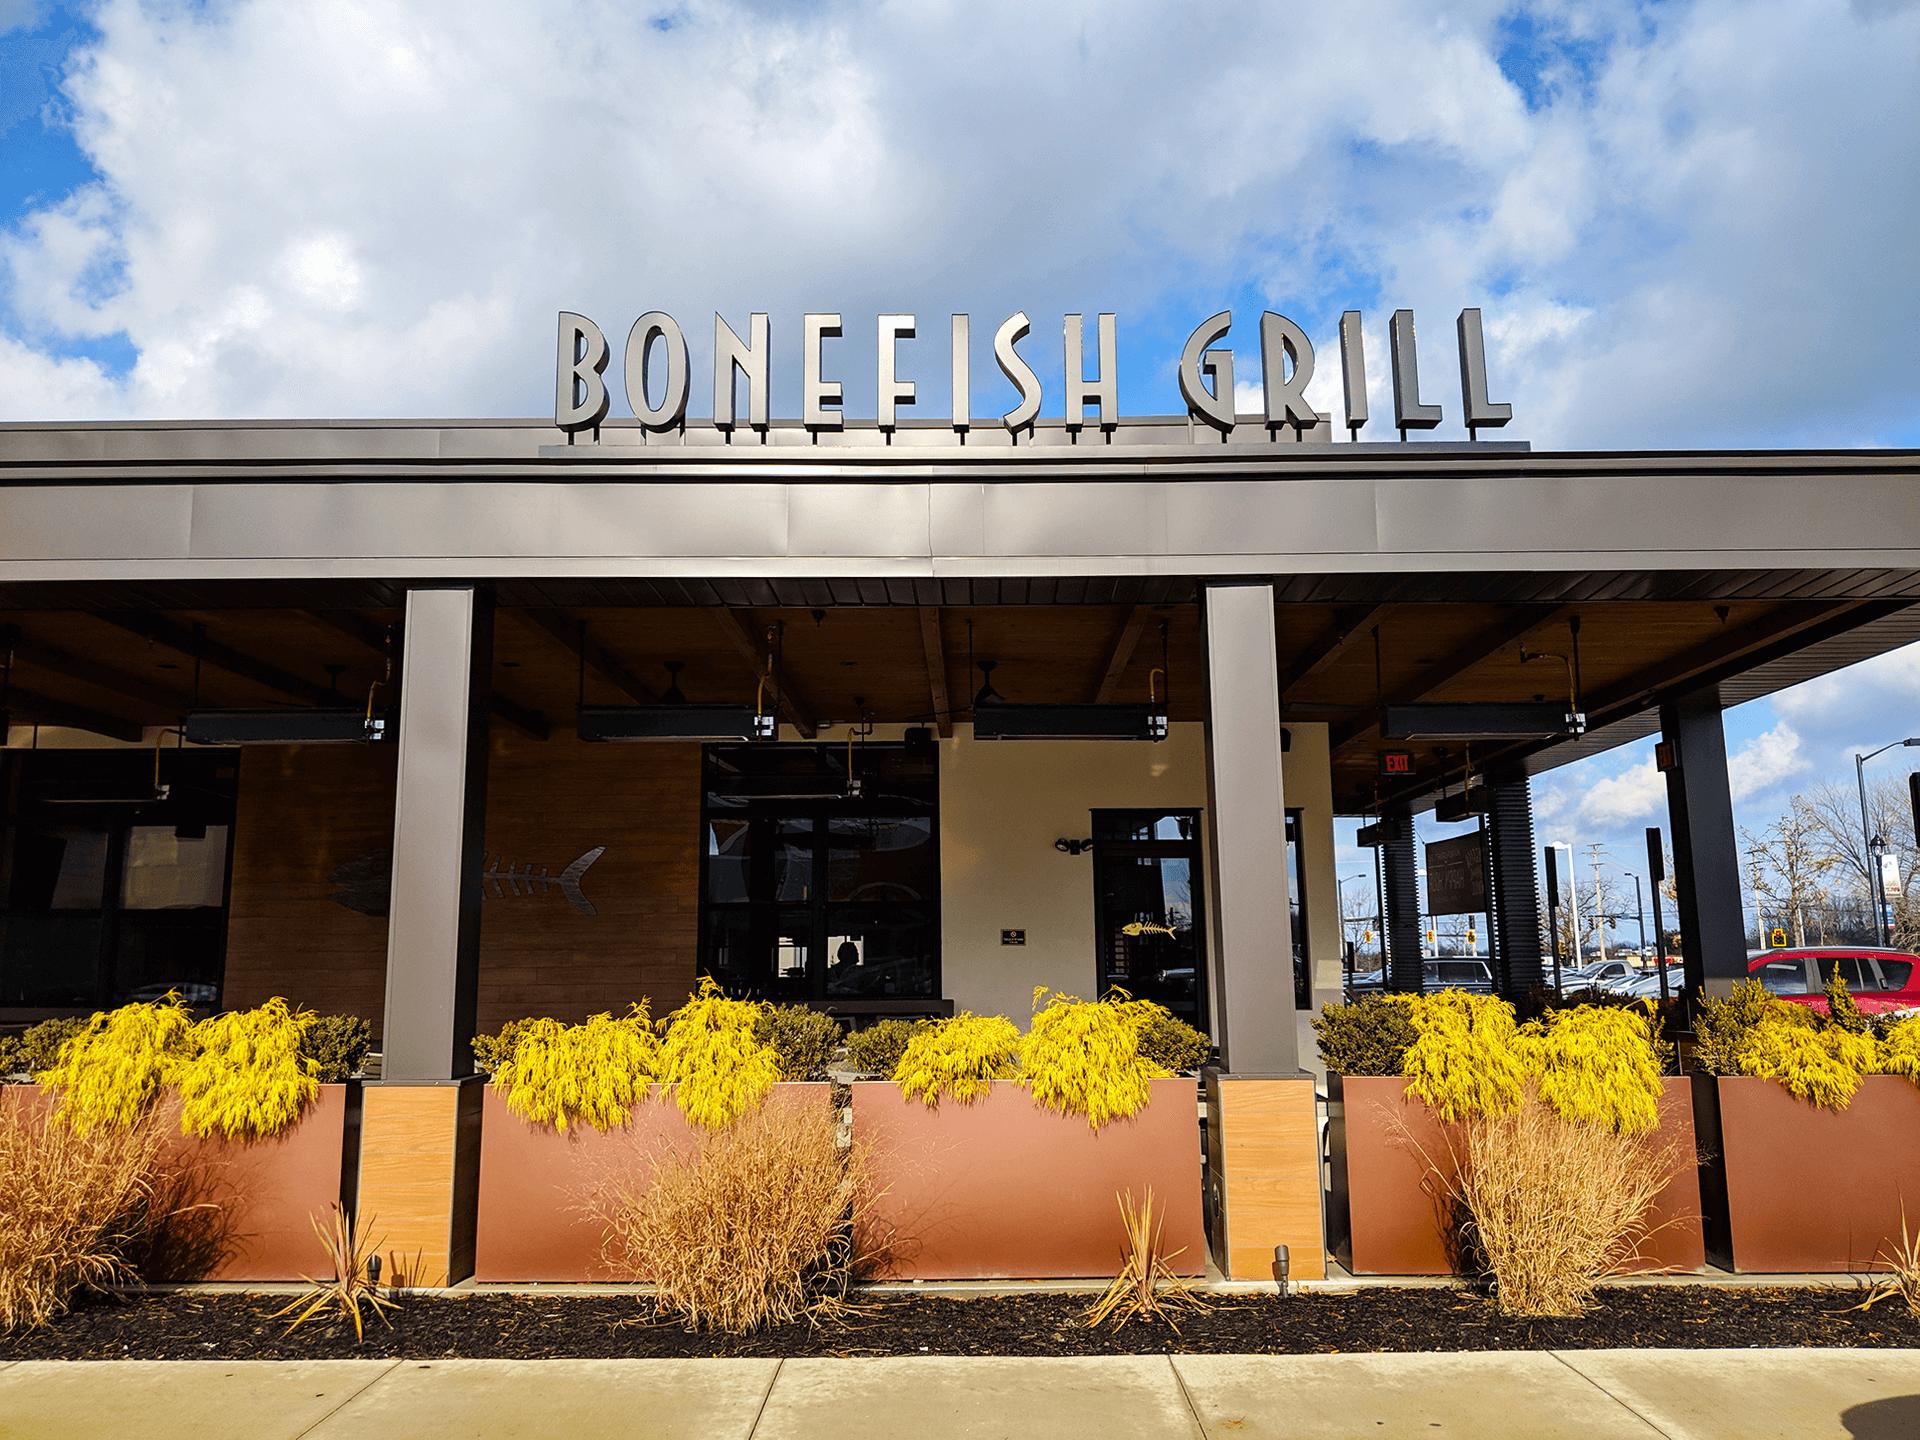 Bonefish Grill Wine Tour Patio Edition